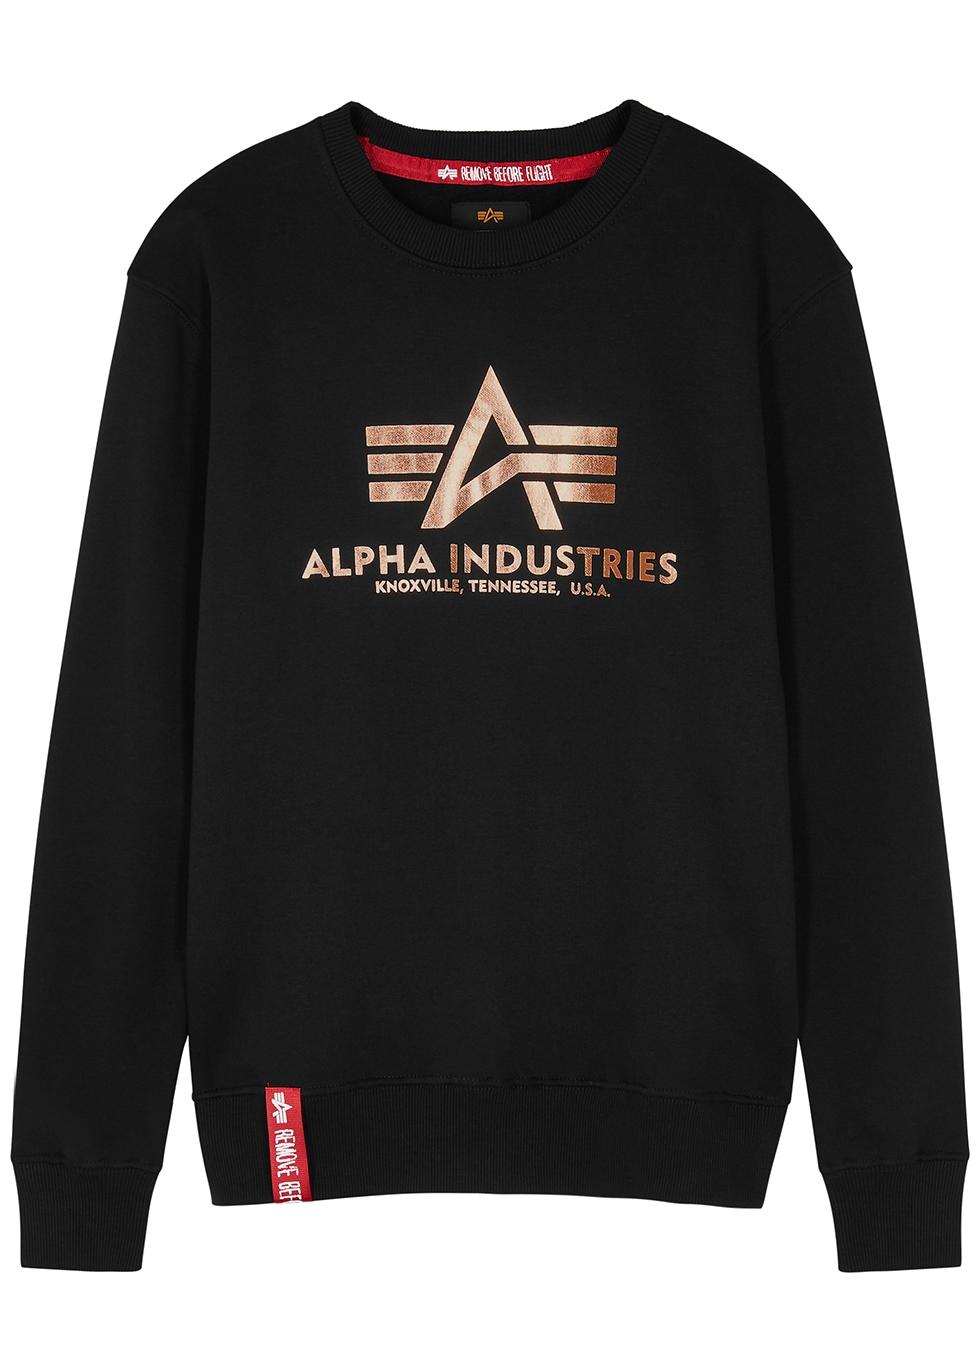 Black logo jersey sweatshirt